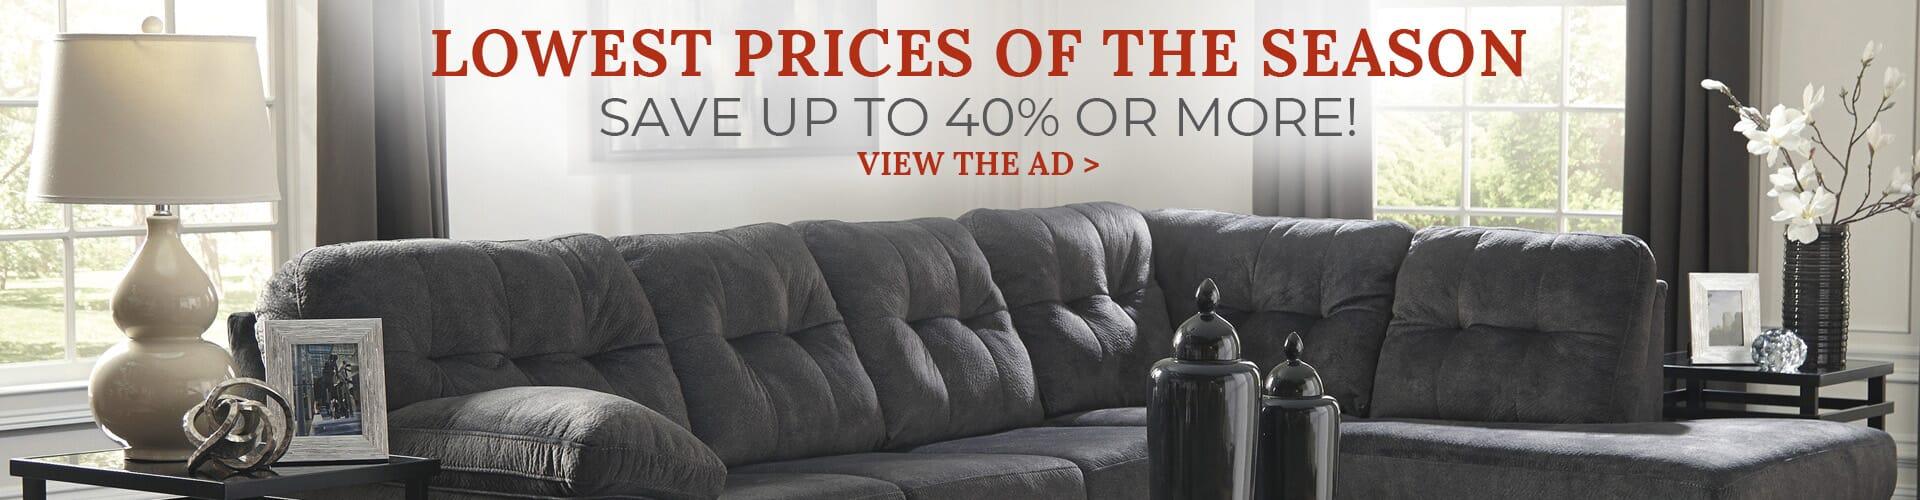 Home Furniture Showroom Wg R Mattress Retailer